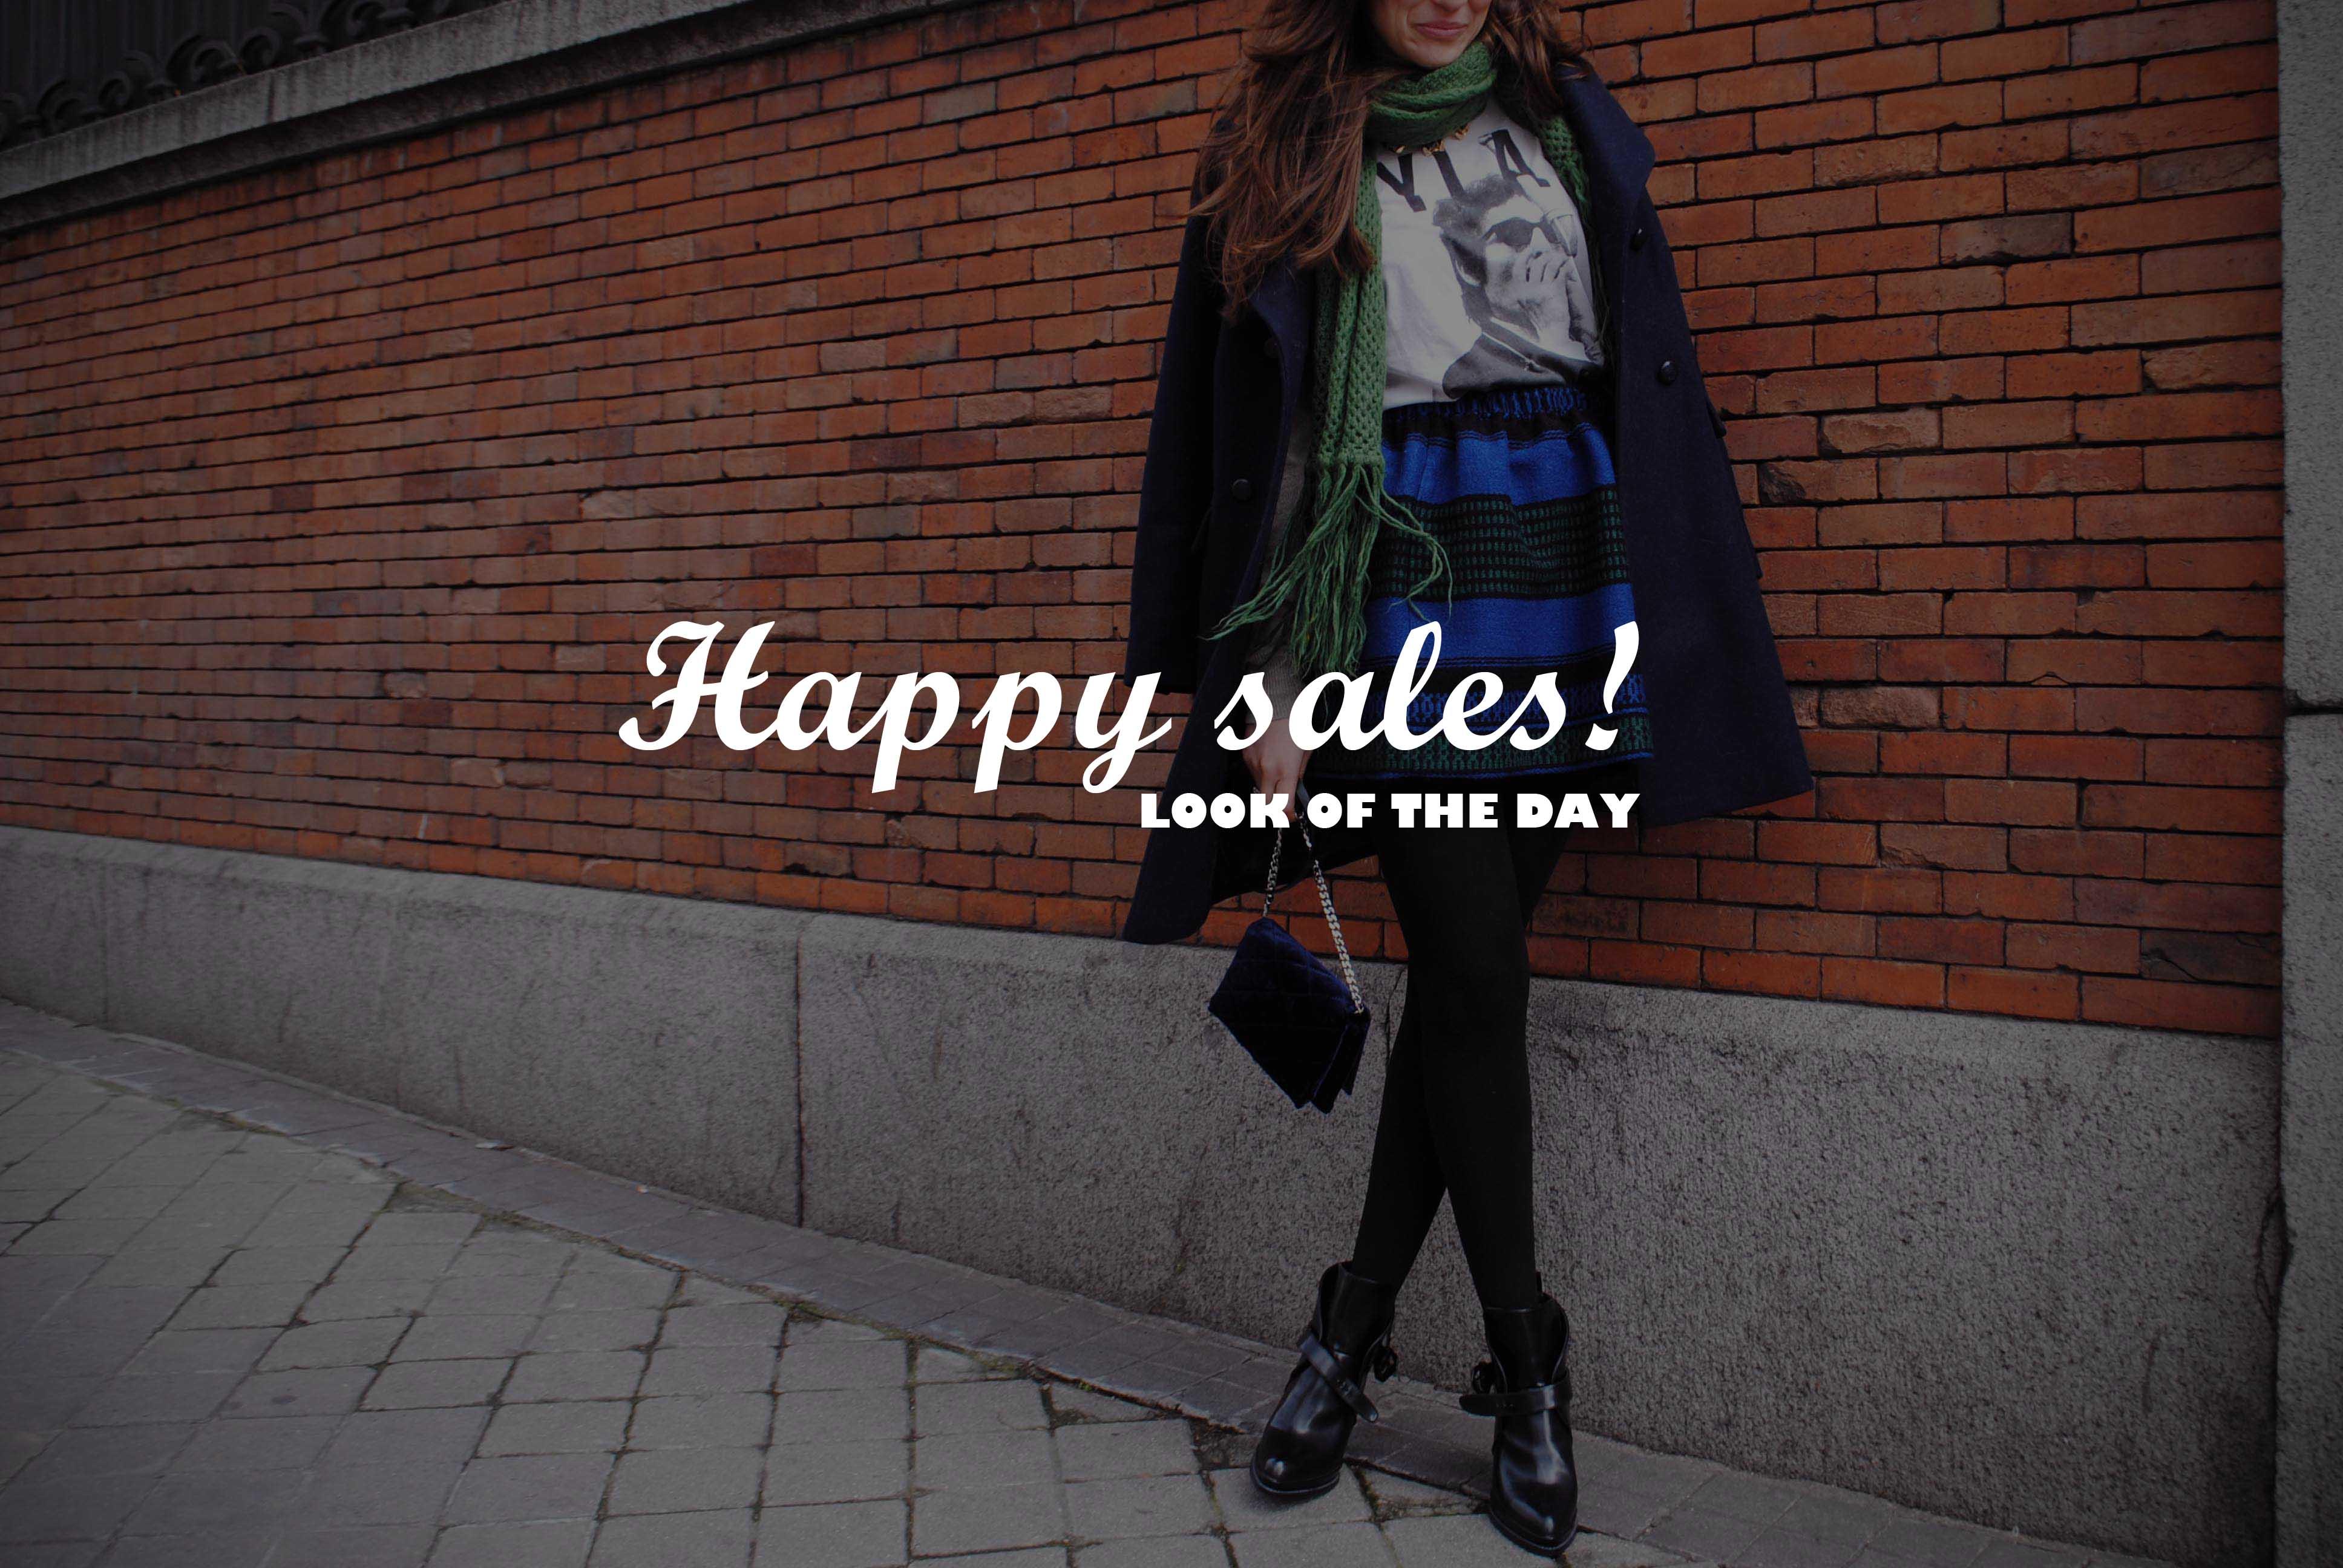 HAPPY SALES!-49724-olindastyle